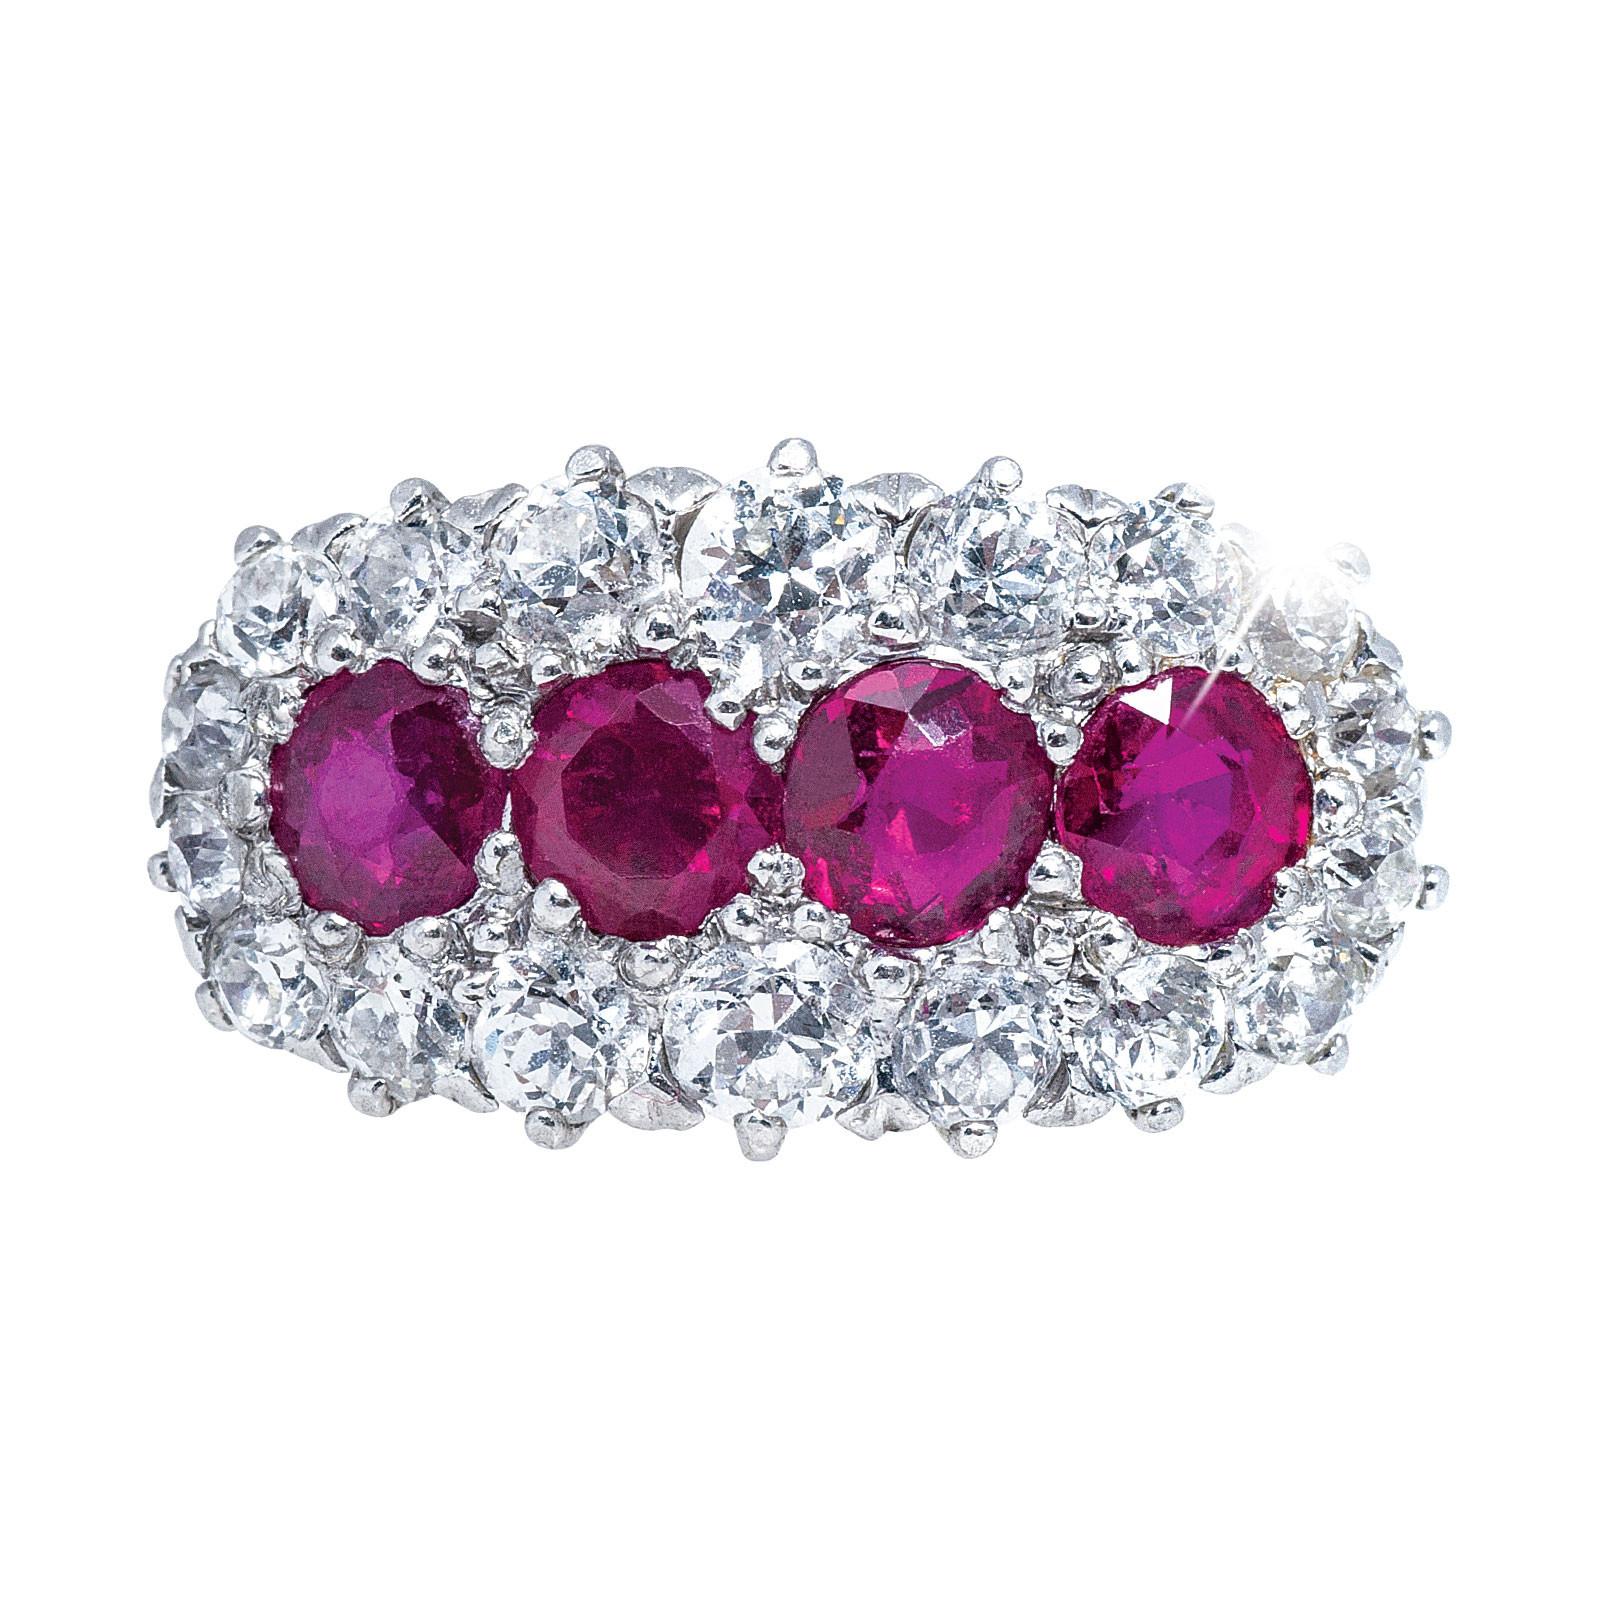 Antique 1.91 CTW Diamond & Ruby Ring